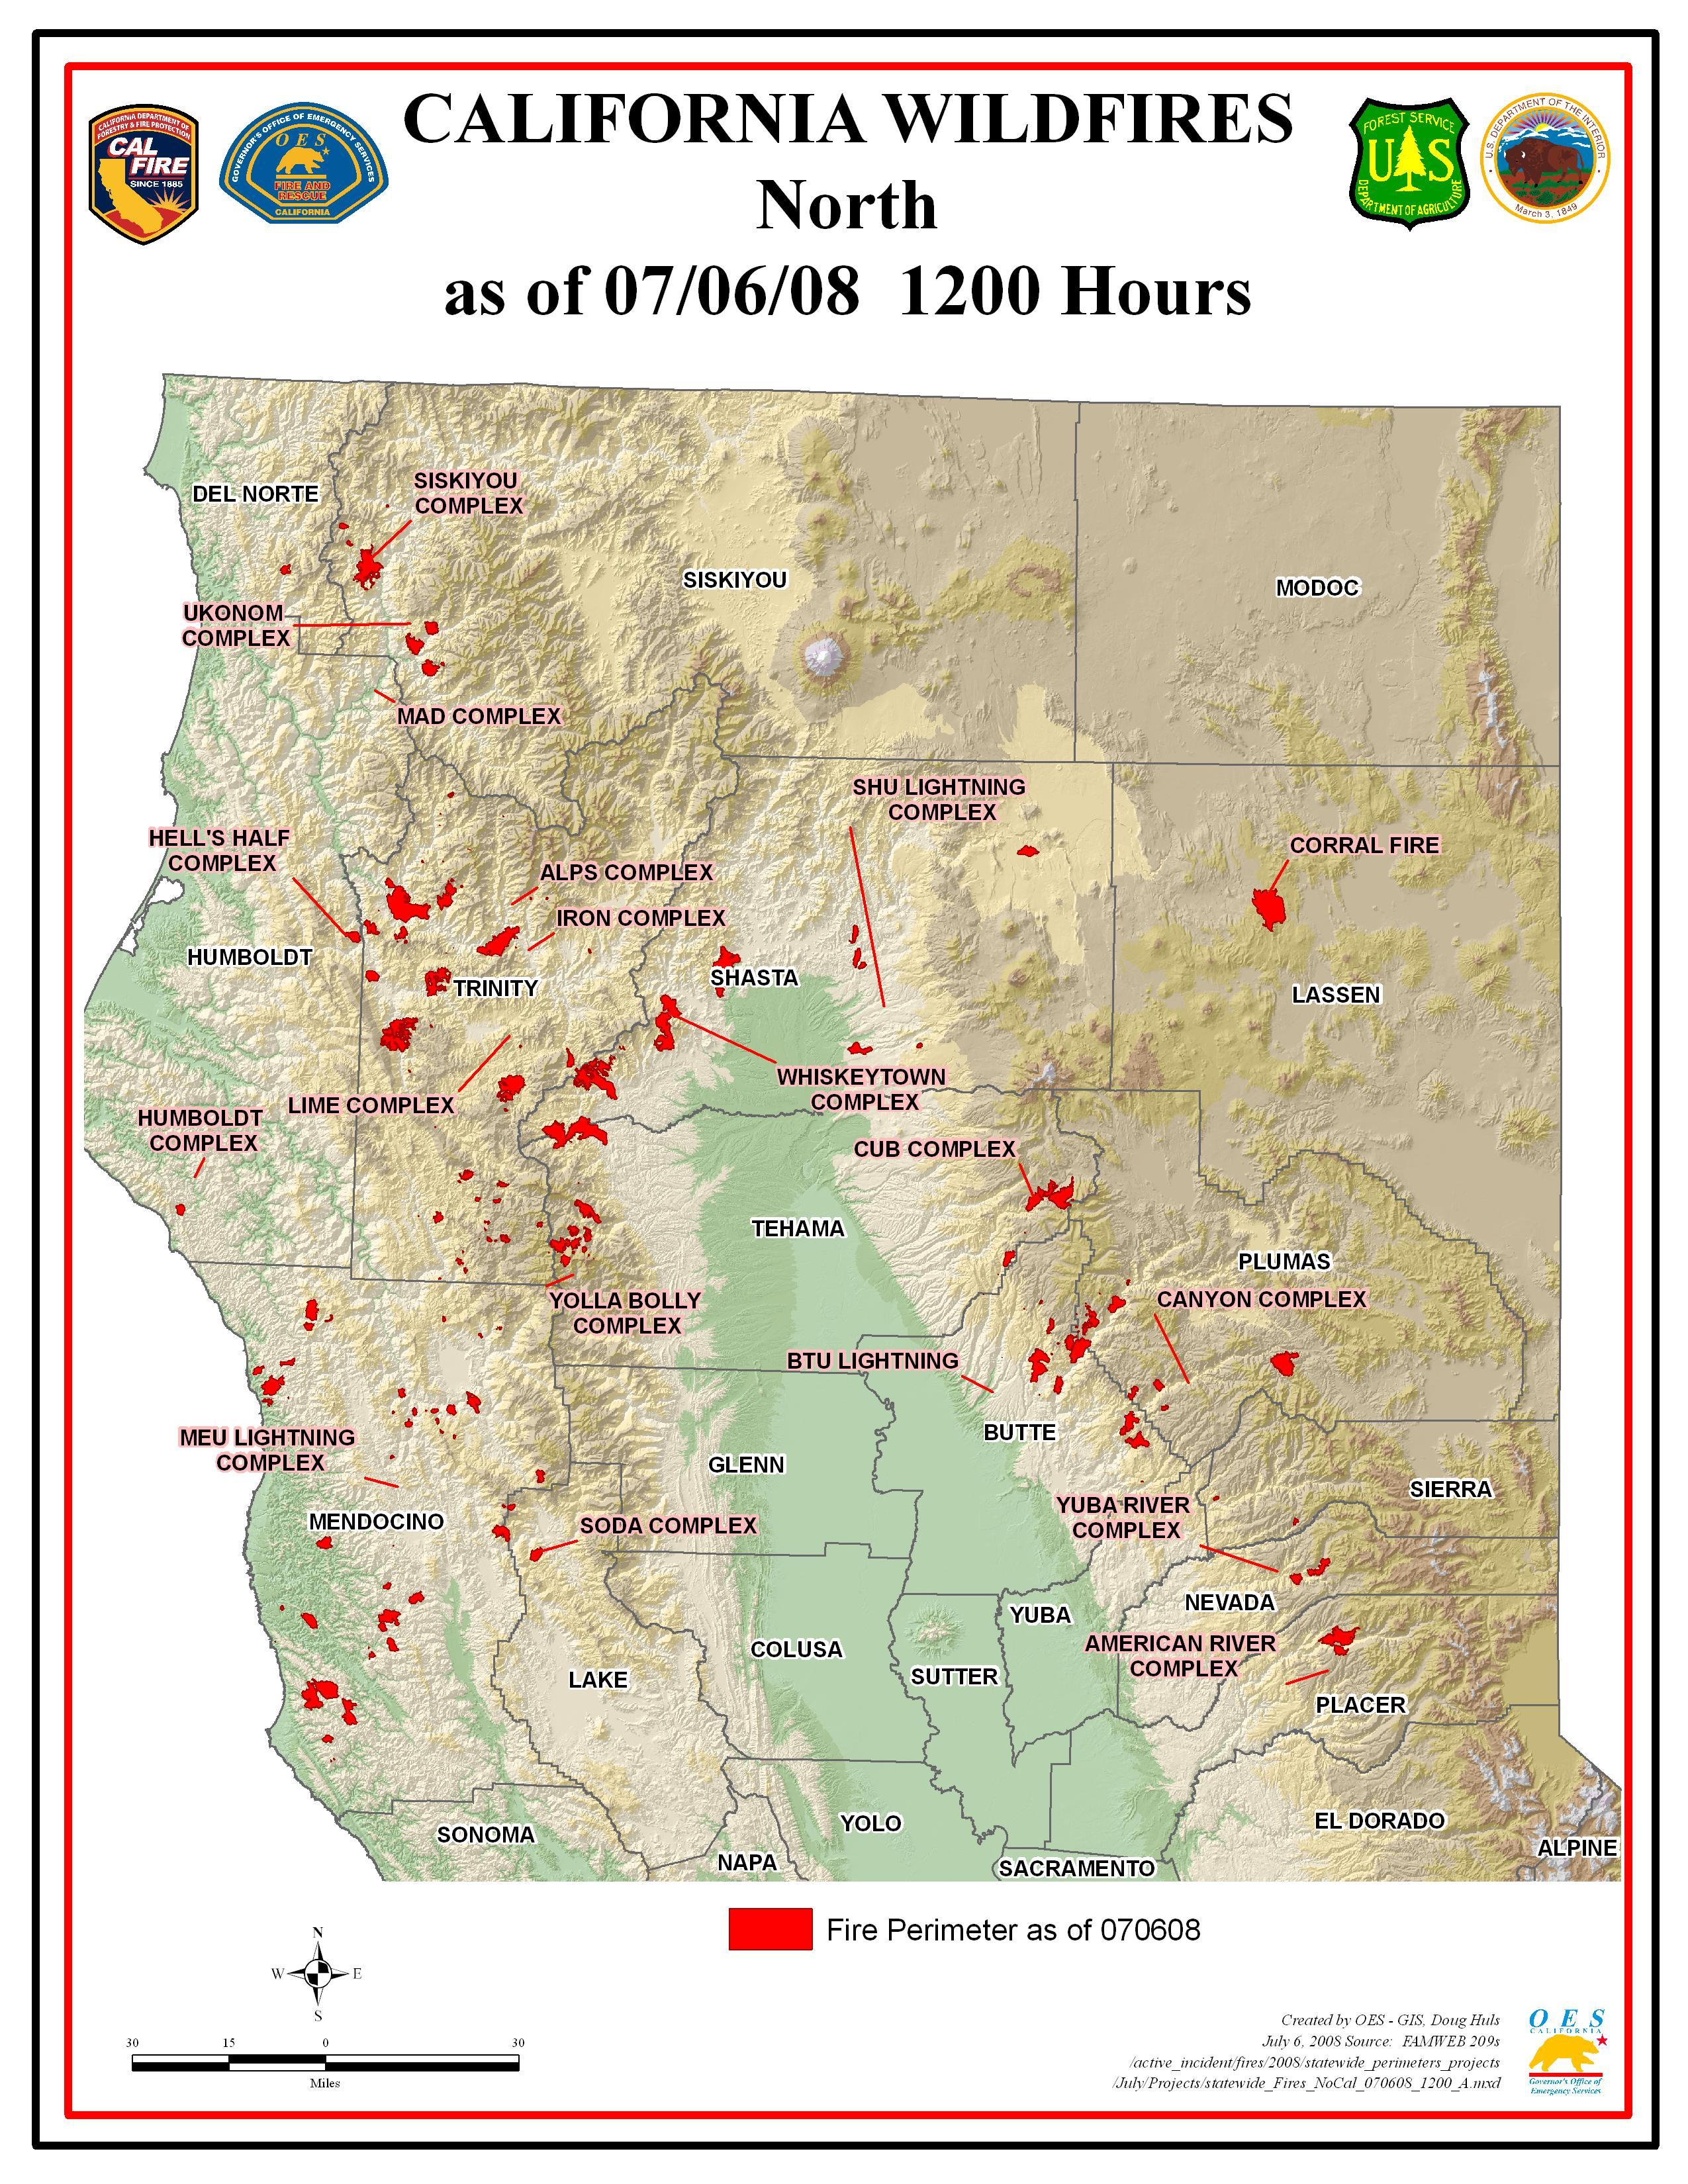 California Fires Map Maps Of California Northern California Fire Map - California Fire Map Google